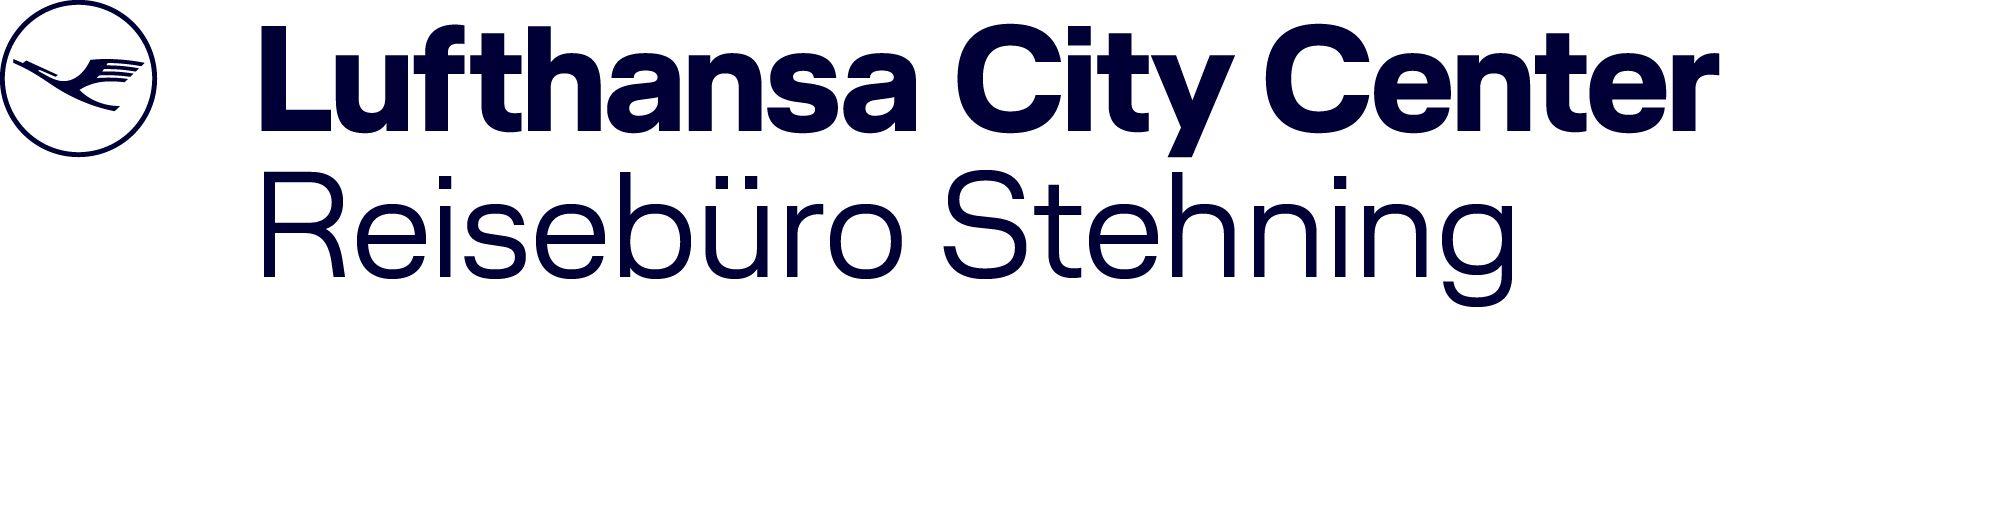 Reisebüro Stehning Lufthansa City Center